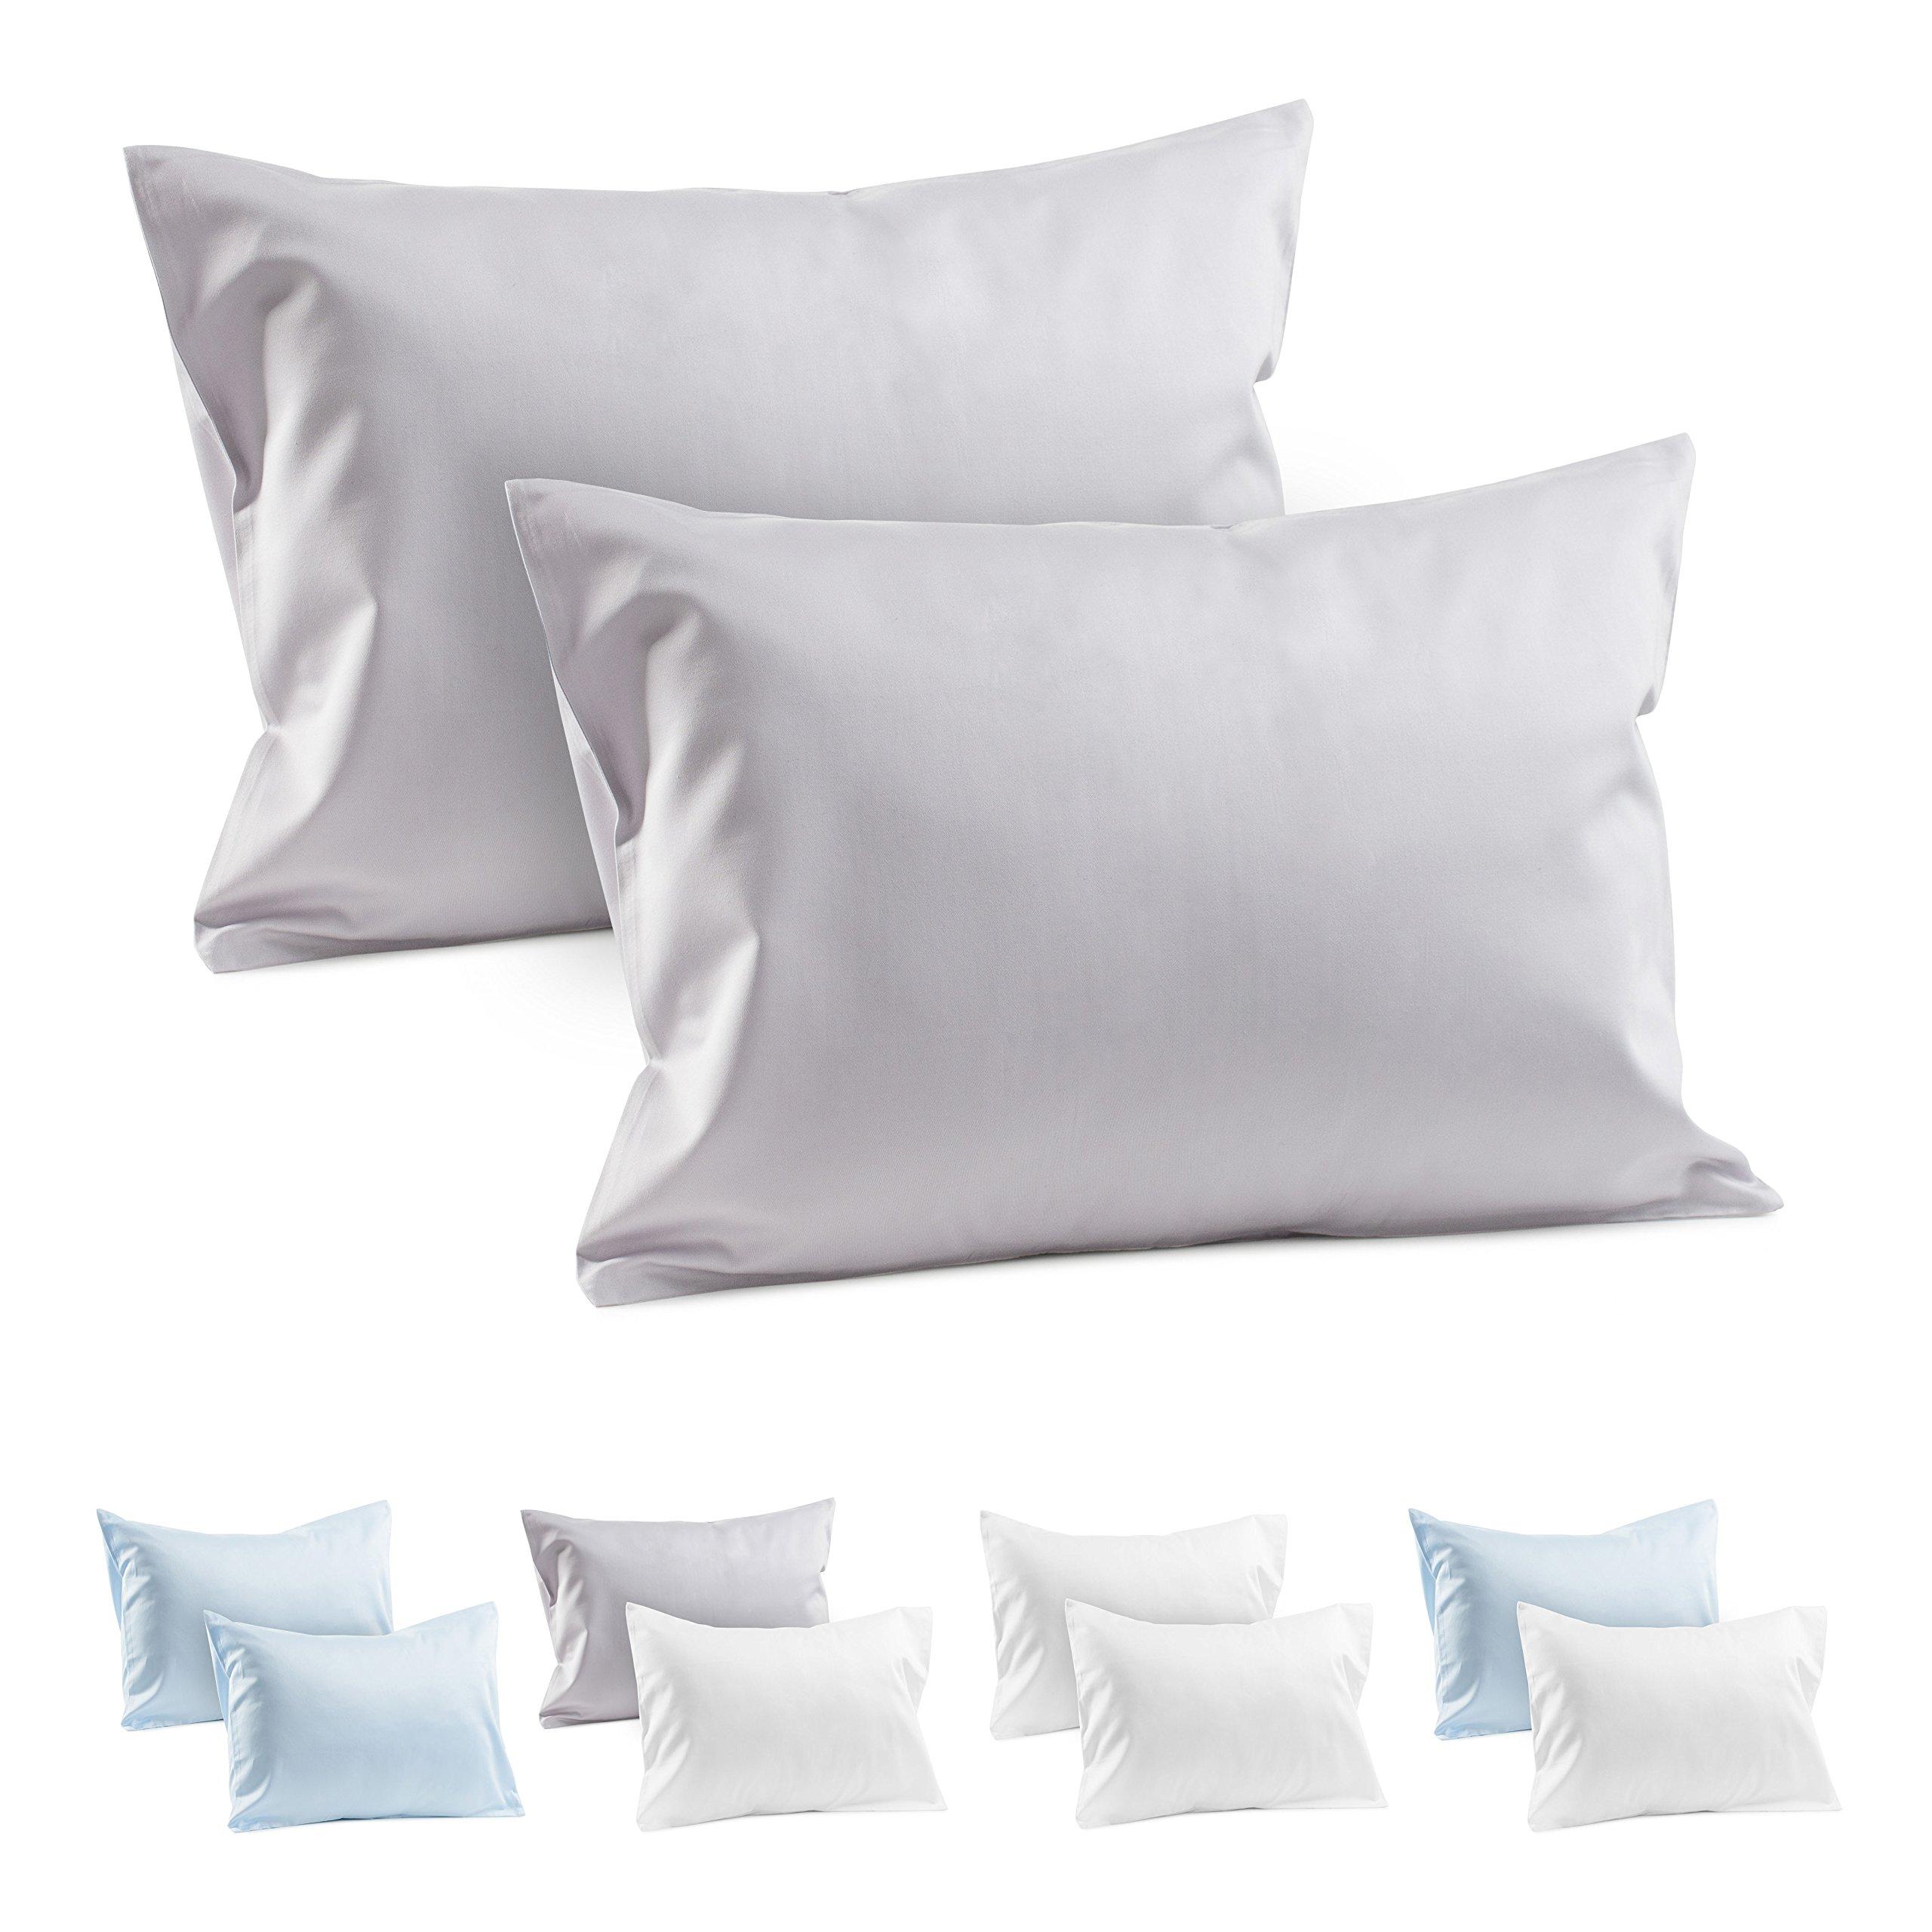 2 Grey Toddler Pillowcases 100% Cotton Sateen Toddler Pillowcase 400 TC Gray Travel Pillowcase Covers 14''x19'' or 13''x18'' Toddler Baby Travel Pillows Gray Naturally Hypoallergenic Envelope Cases Grey